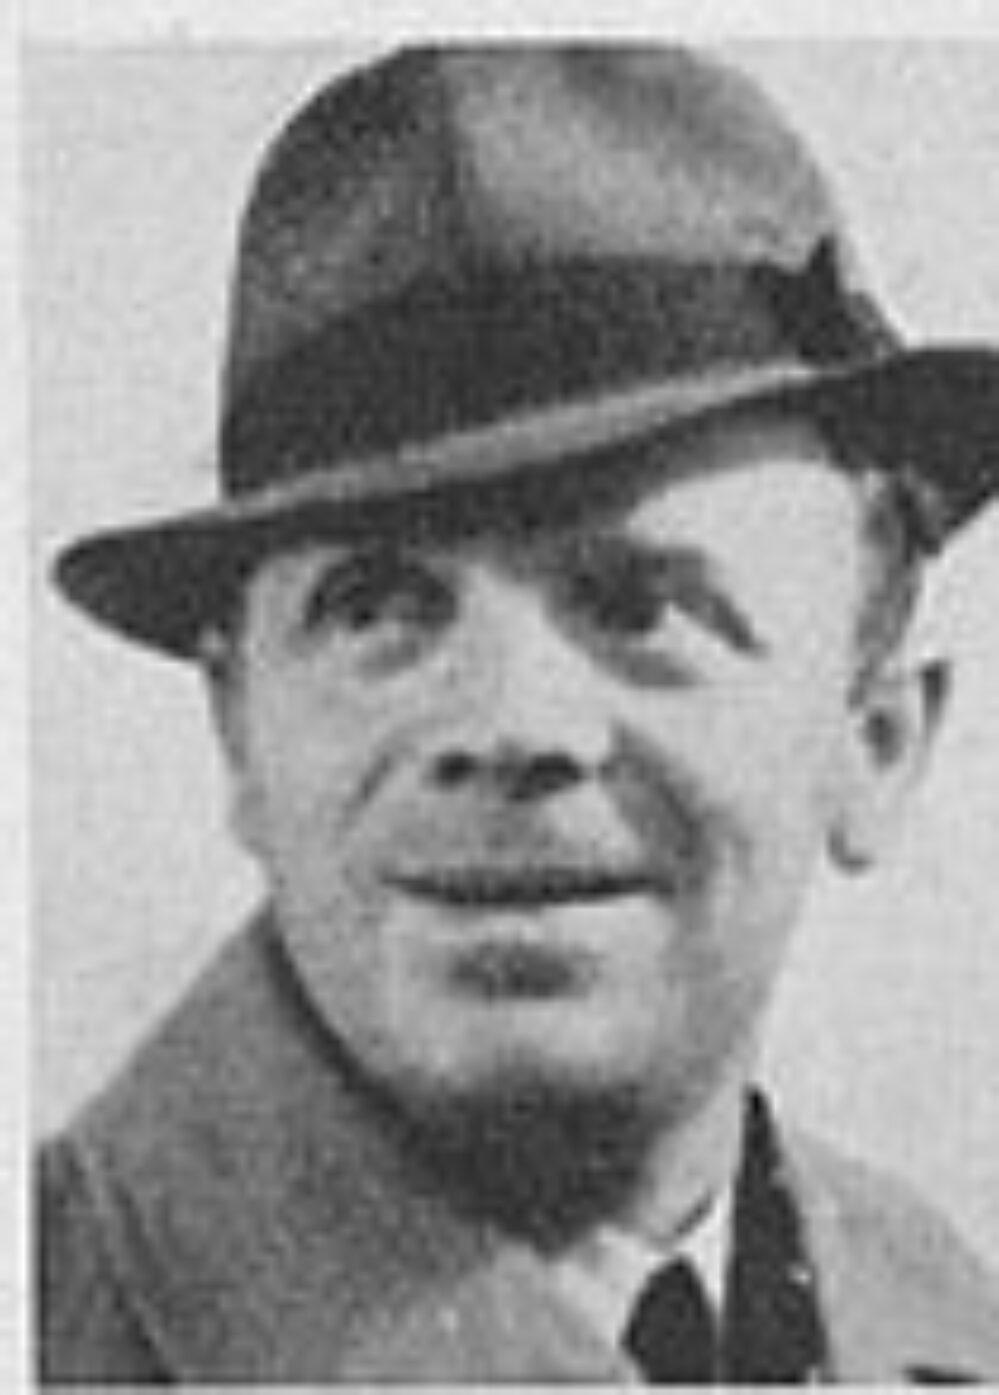 Jens Matheus Brandvold